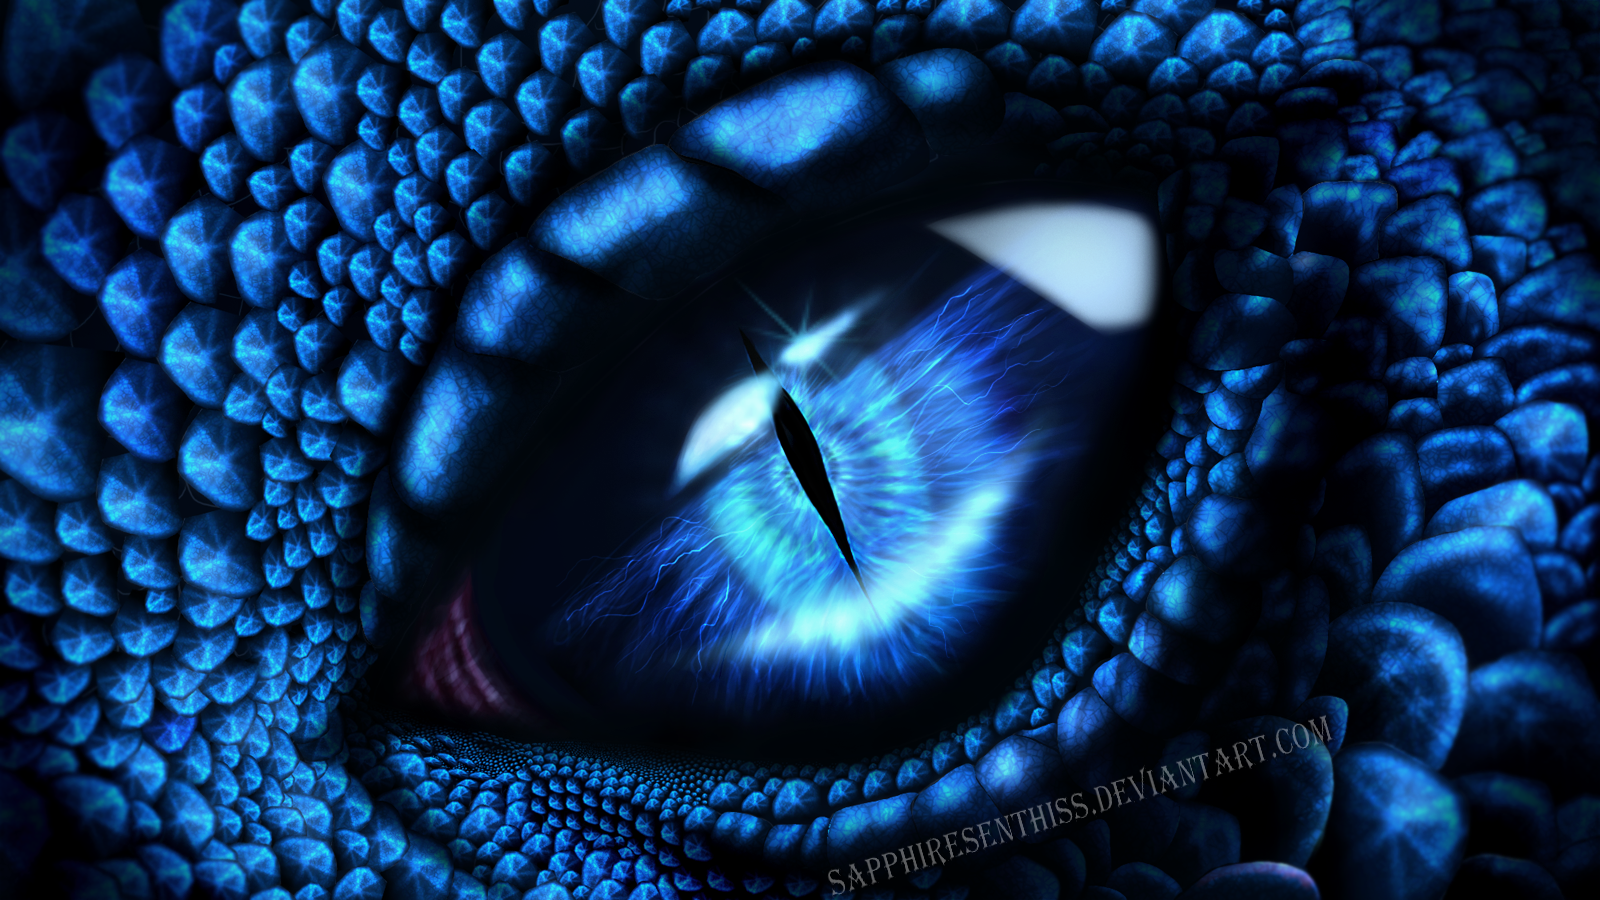 Dragon eye wallpaper wallpapersafari - Eye drawing wallpaper ...